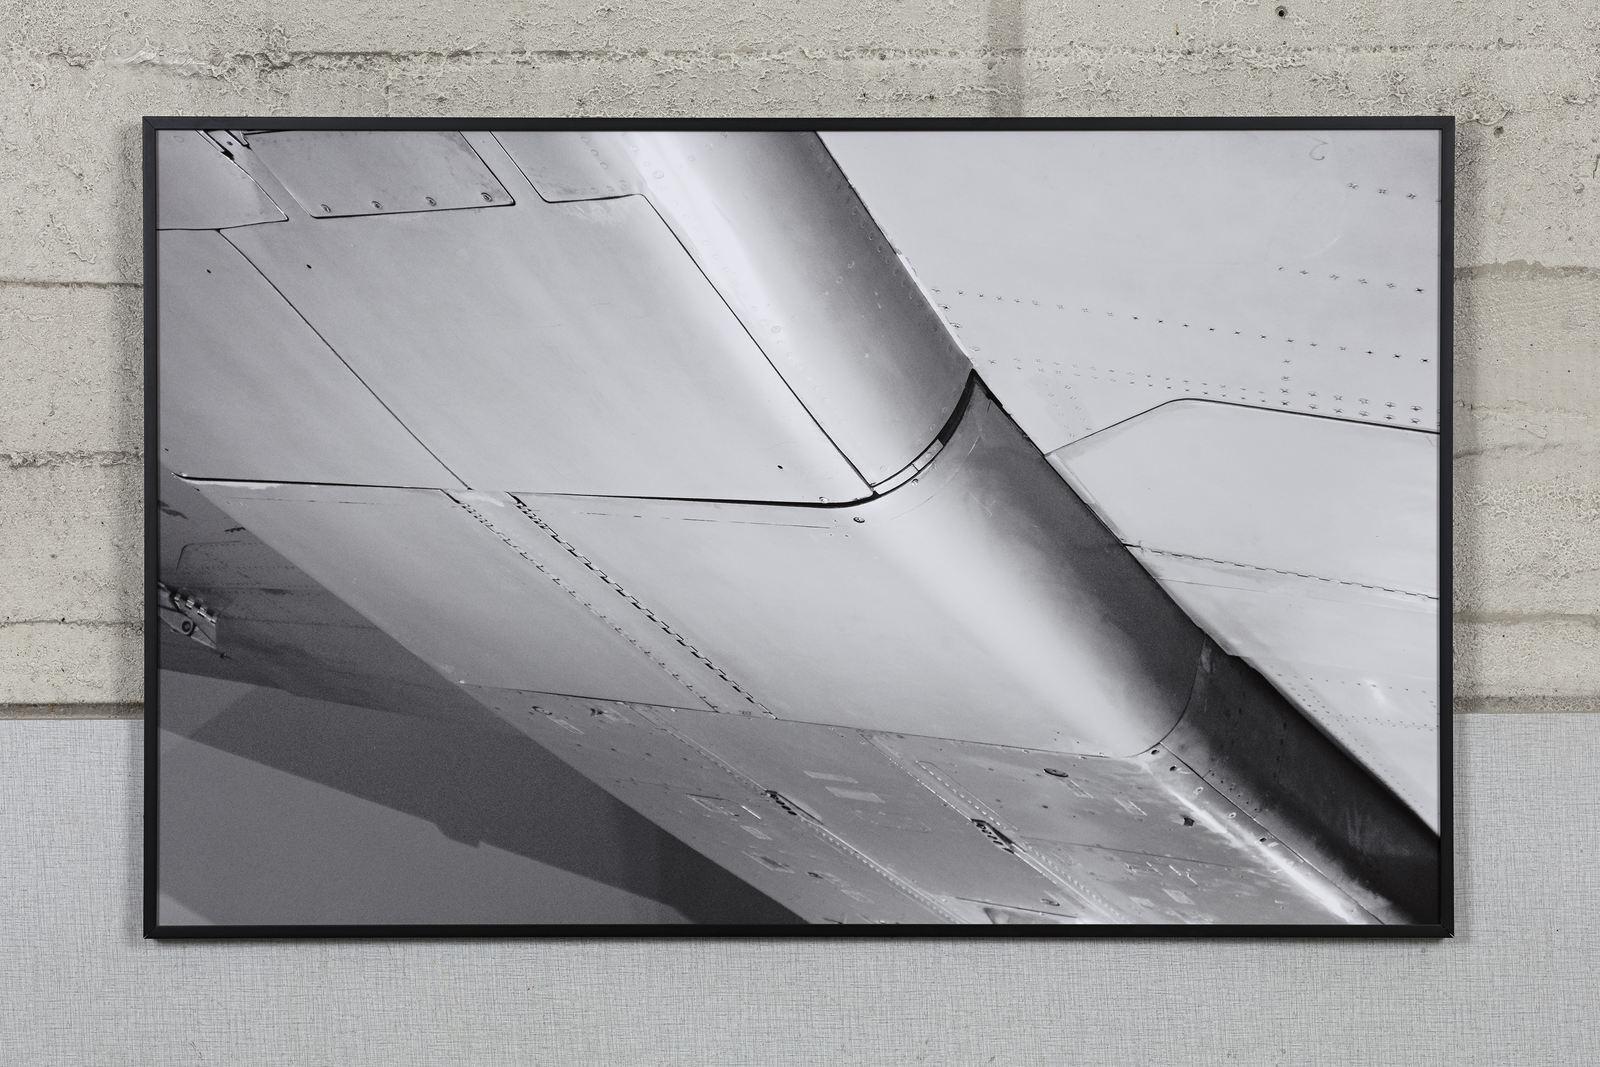 SCHLOSS_seansnyder_Norwegian Aviation Museum, (Northrop F5A)